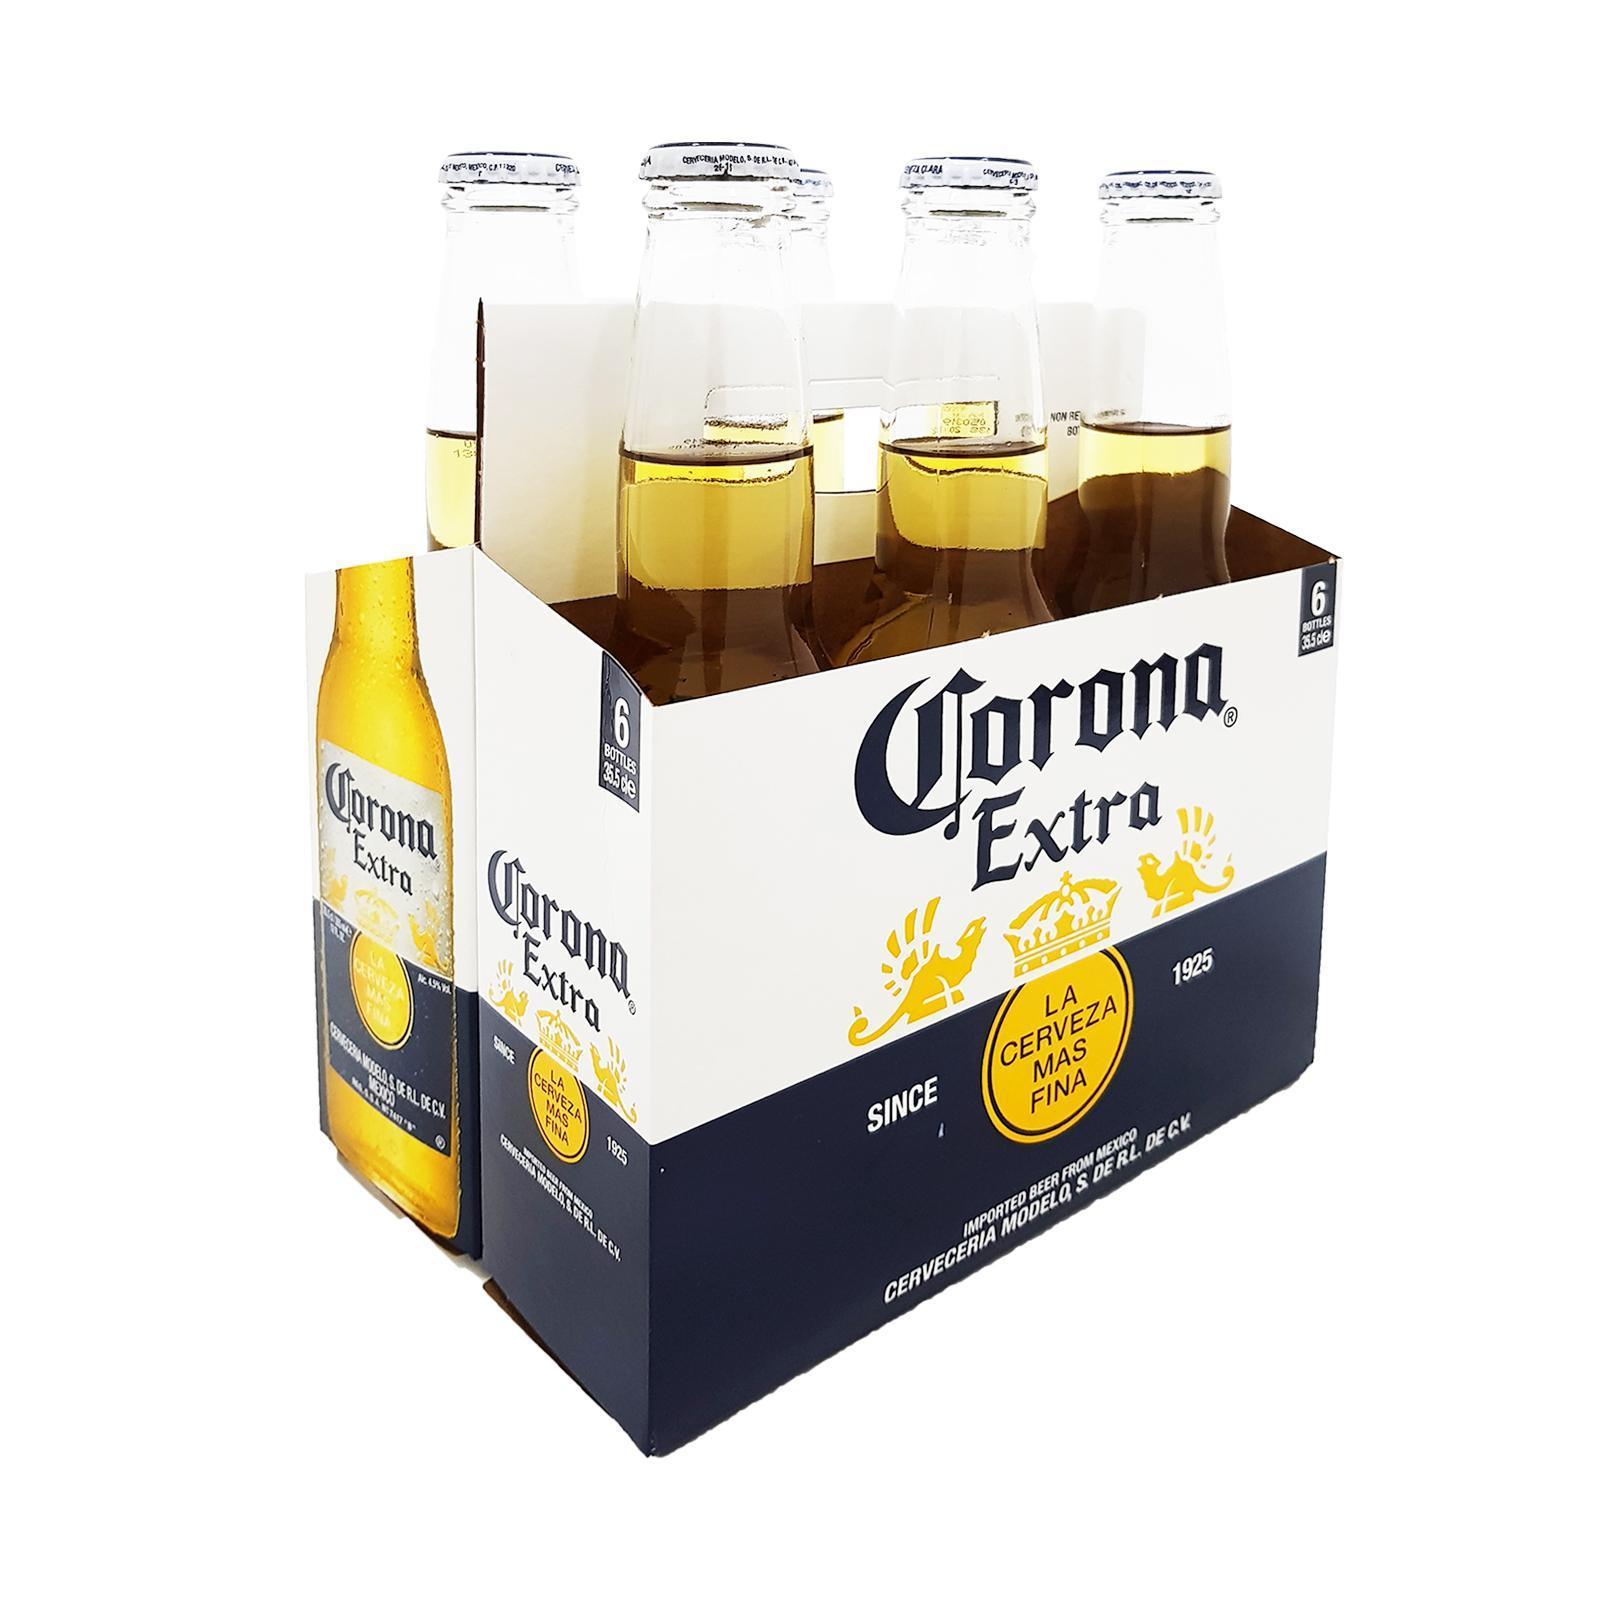 CORONA Extra Beer Bottles 6sX355ml